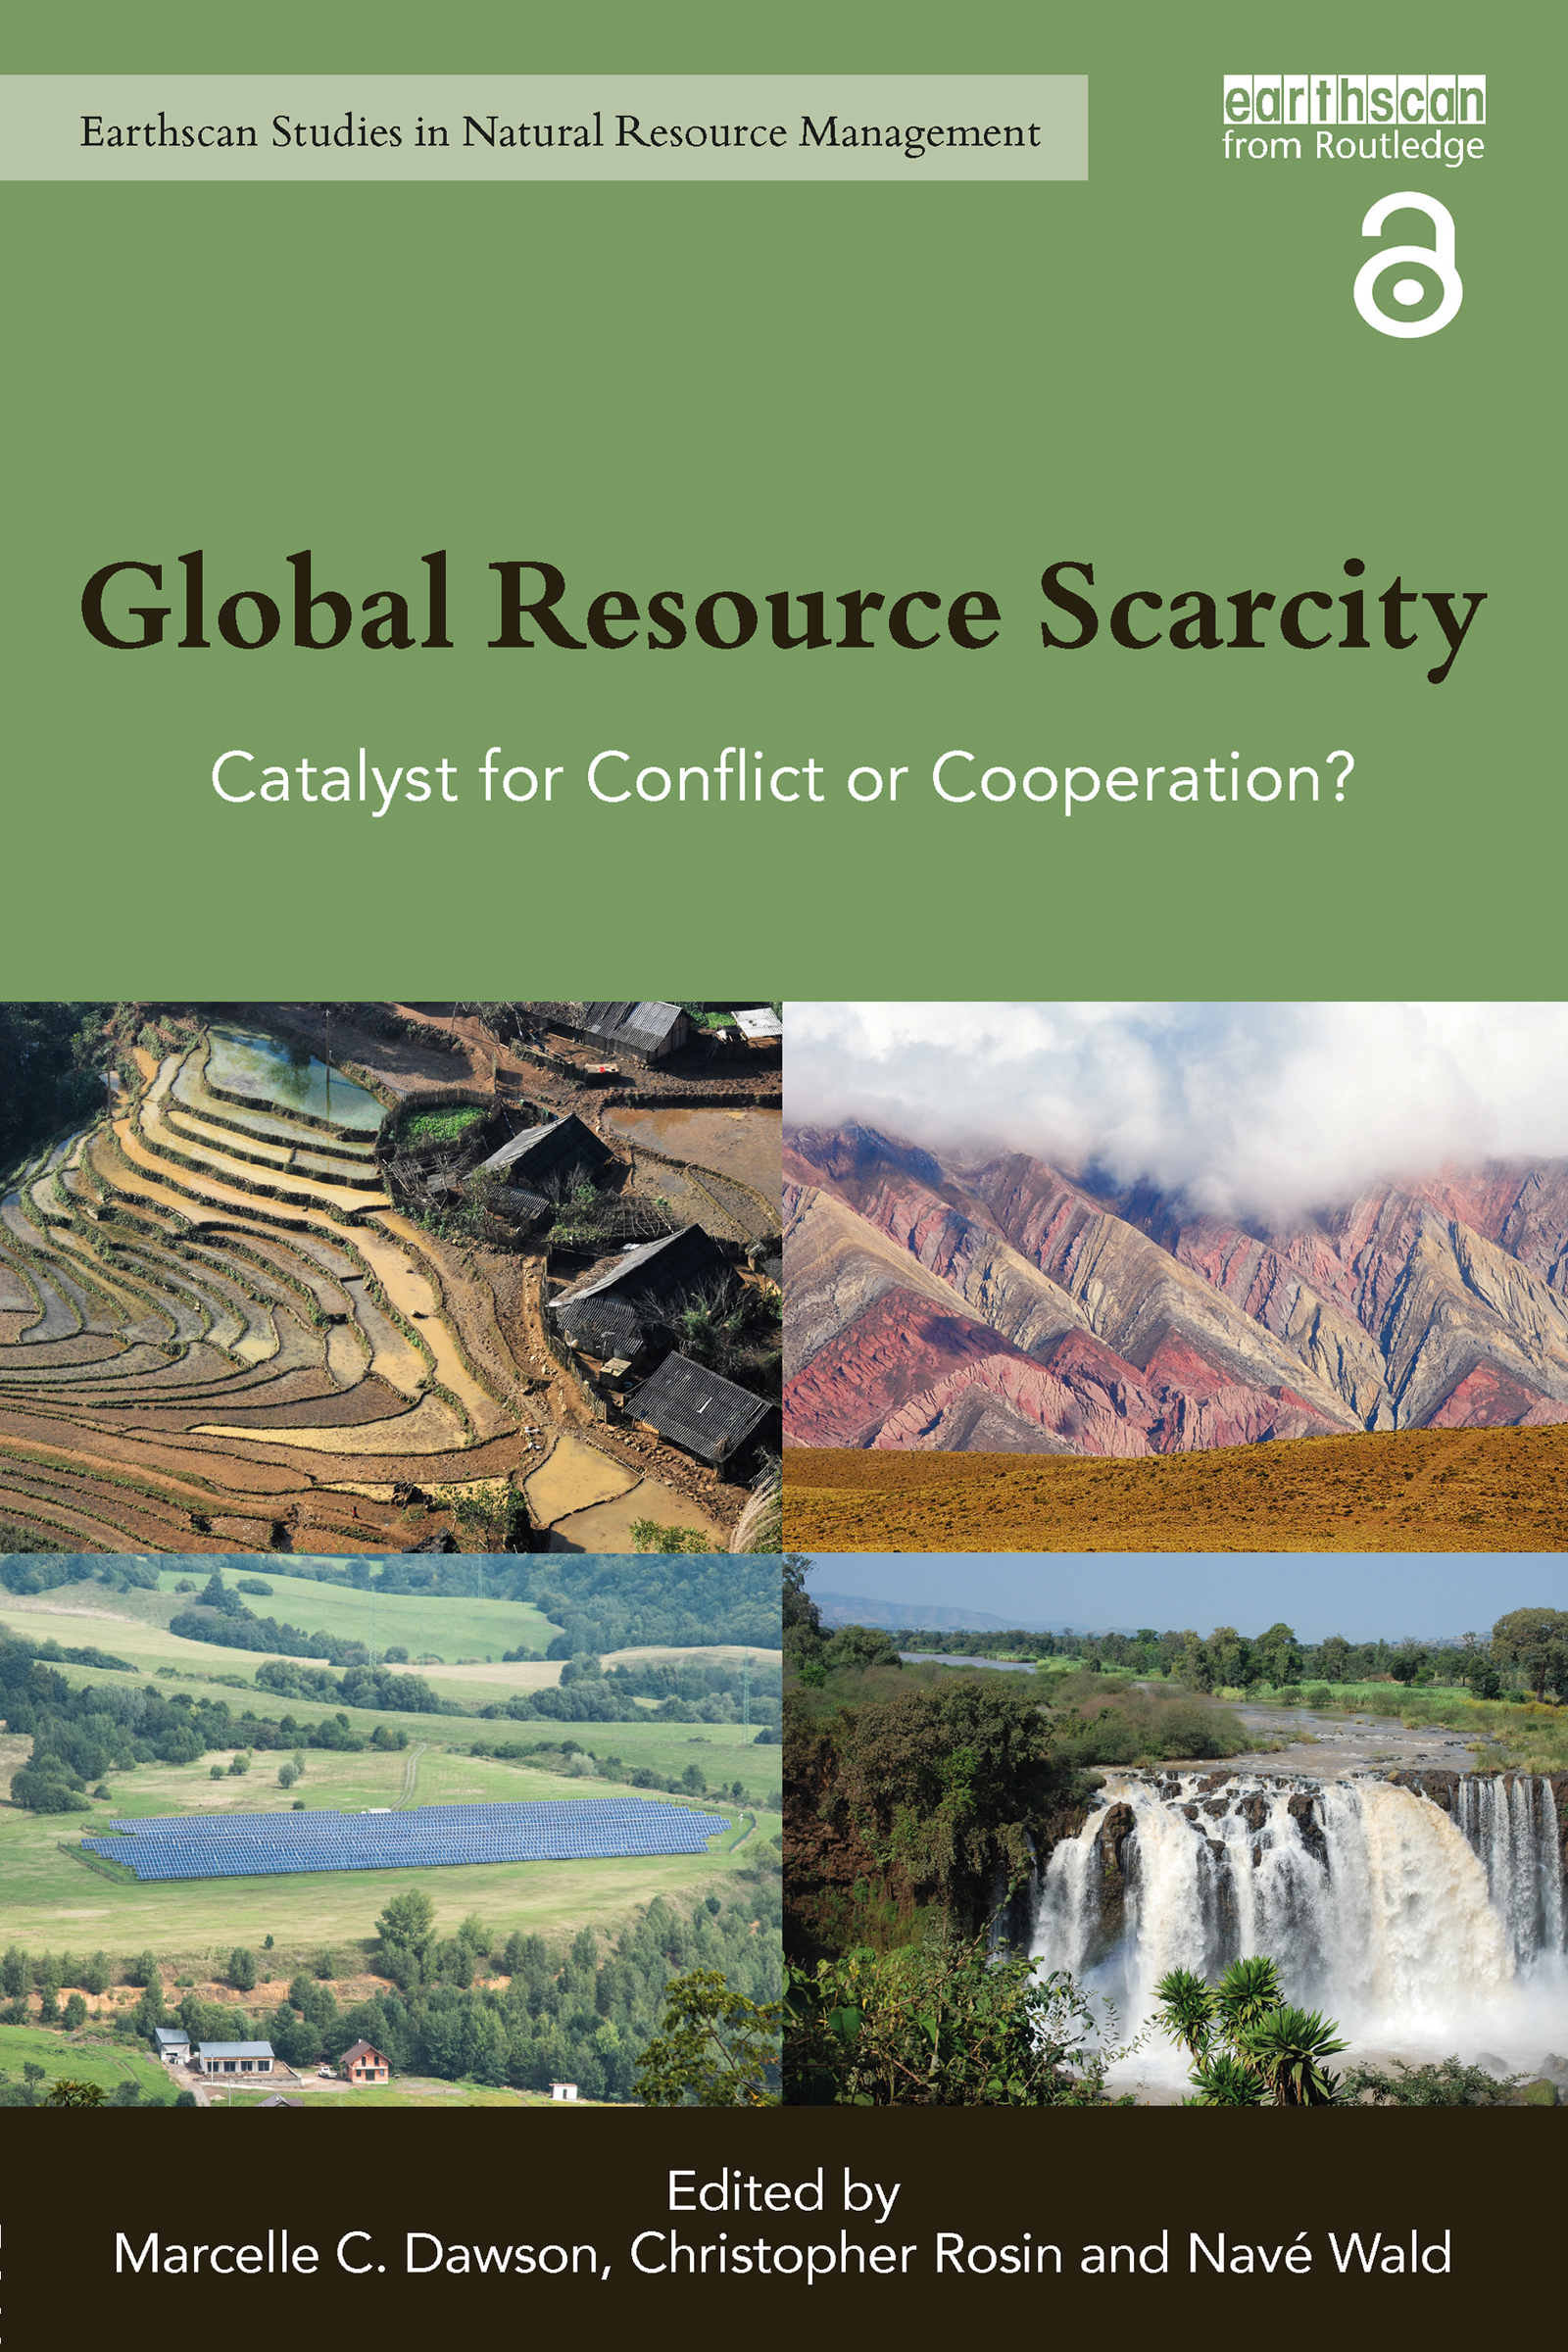 Global Resource Scarcity